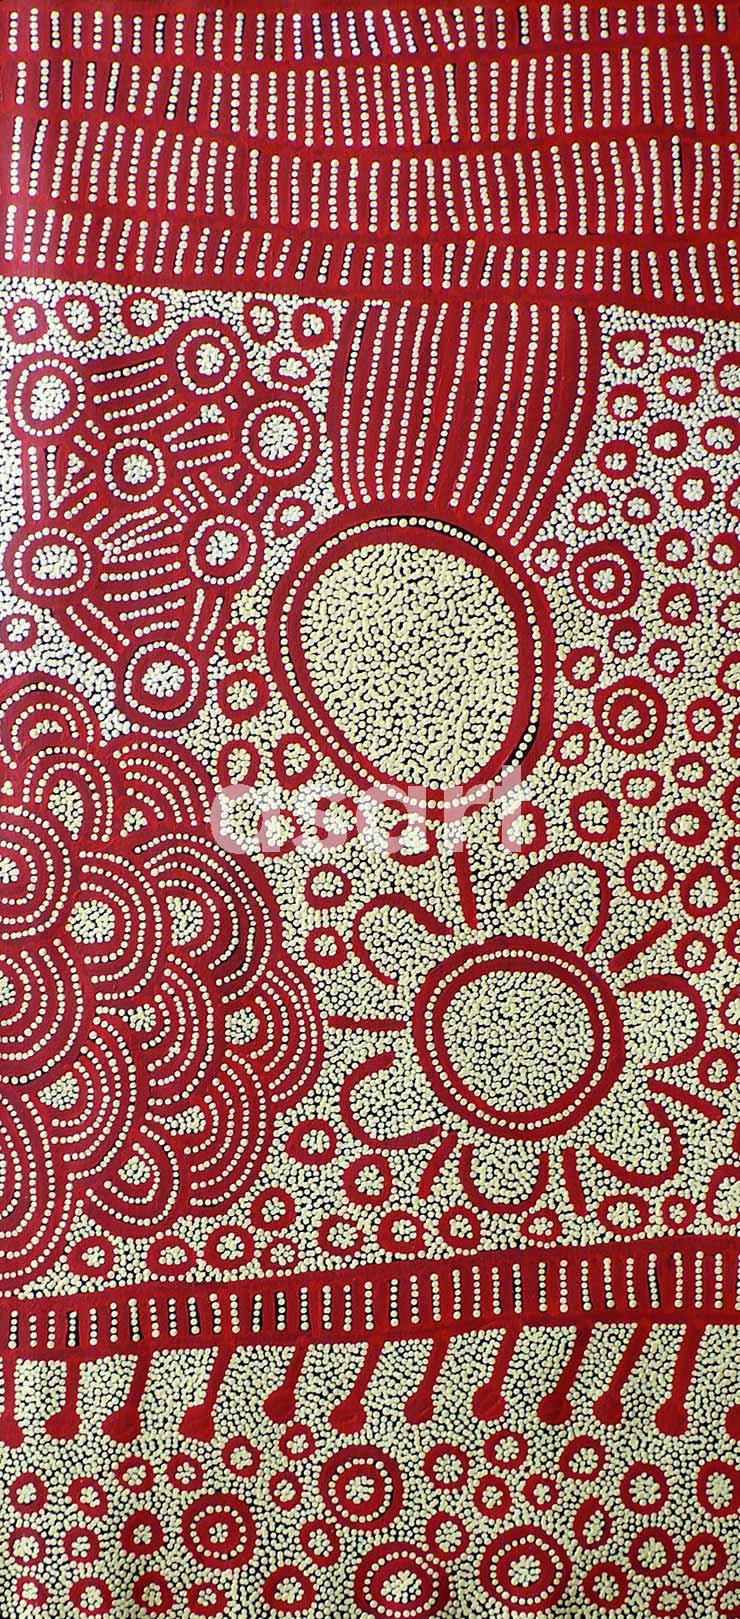 My Dreaming (11YN004), by Aboriginal artist Yinarupa Nangala (Australia)